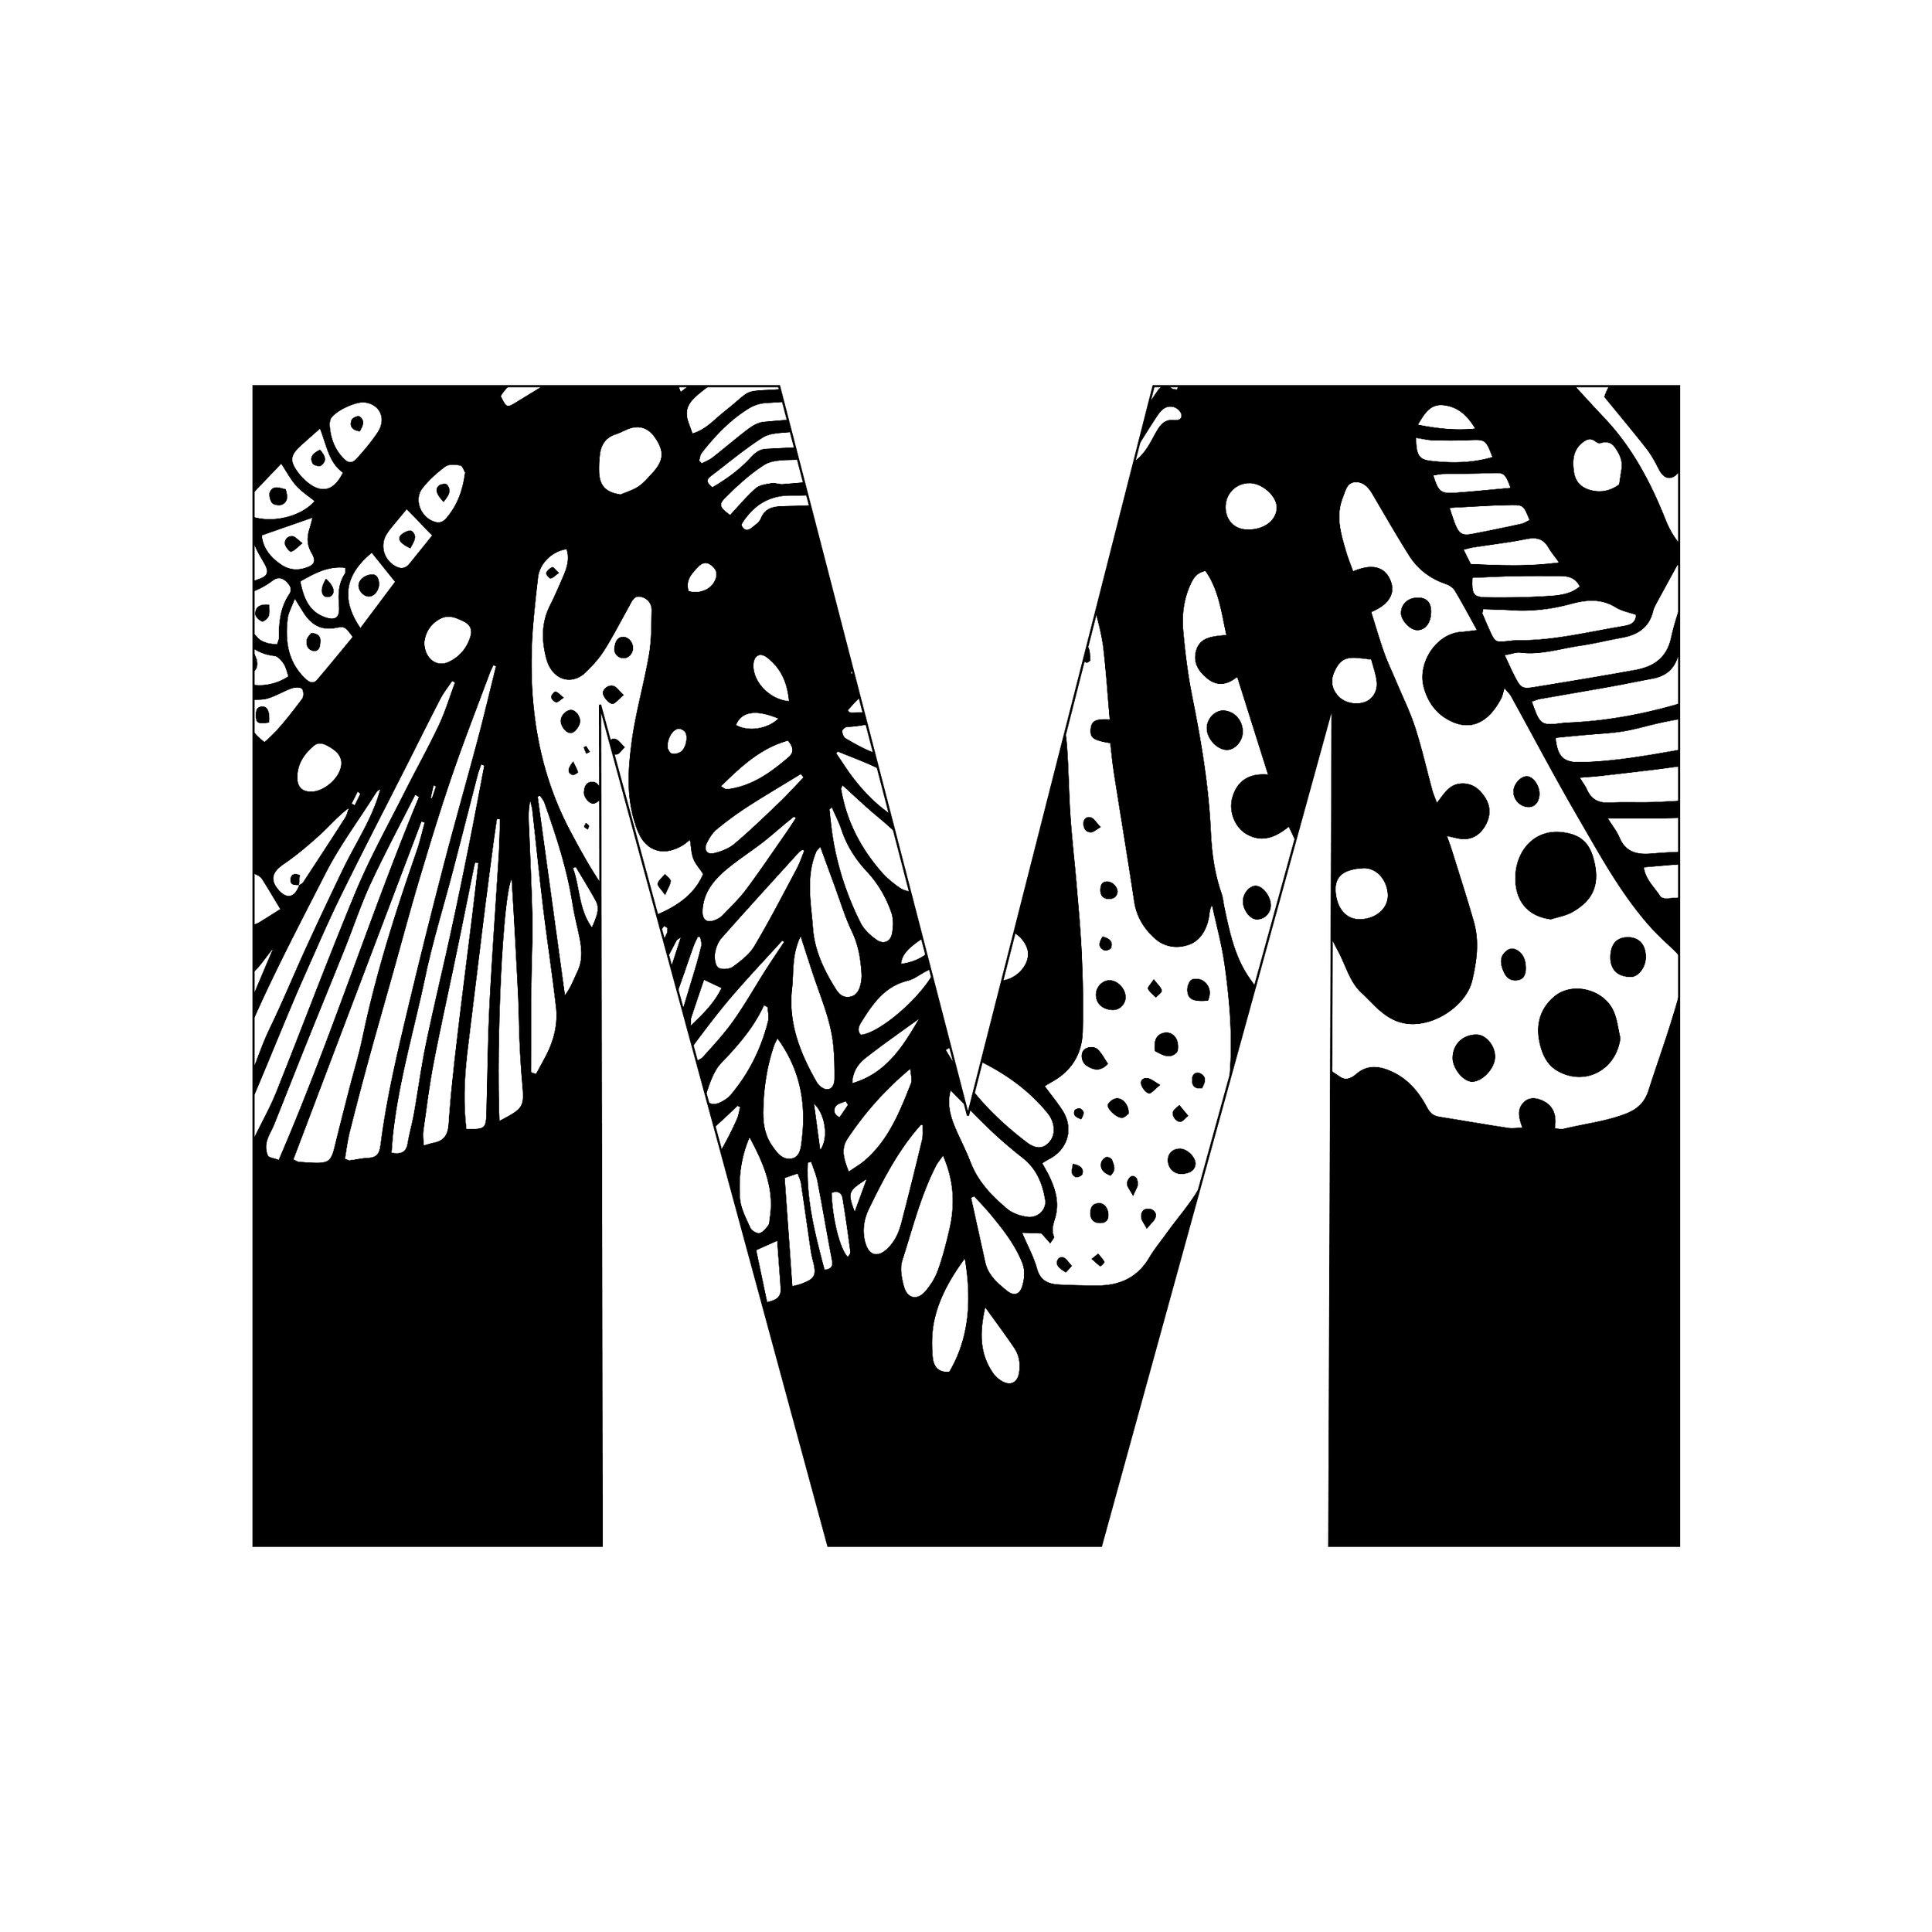 M 1-1.jpg